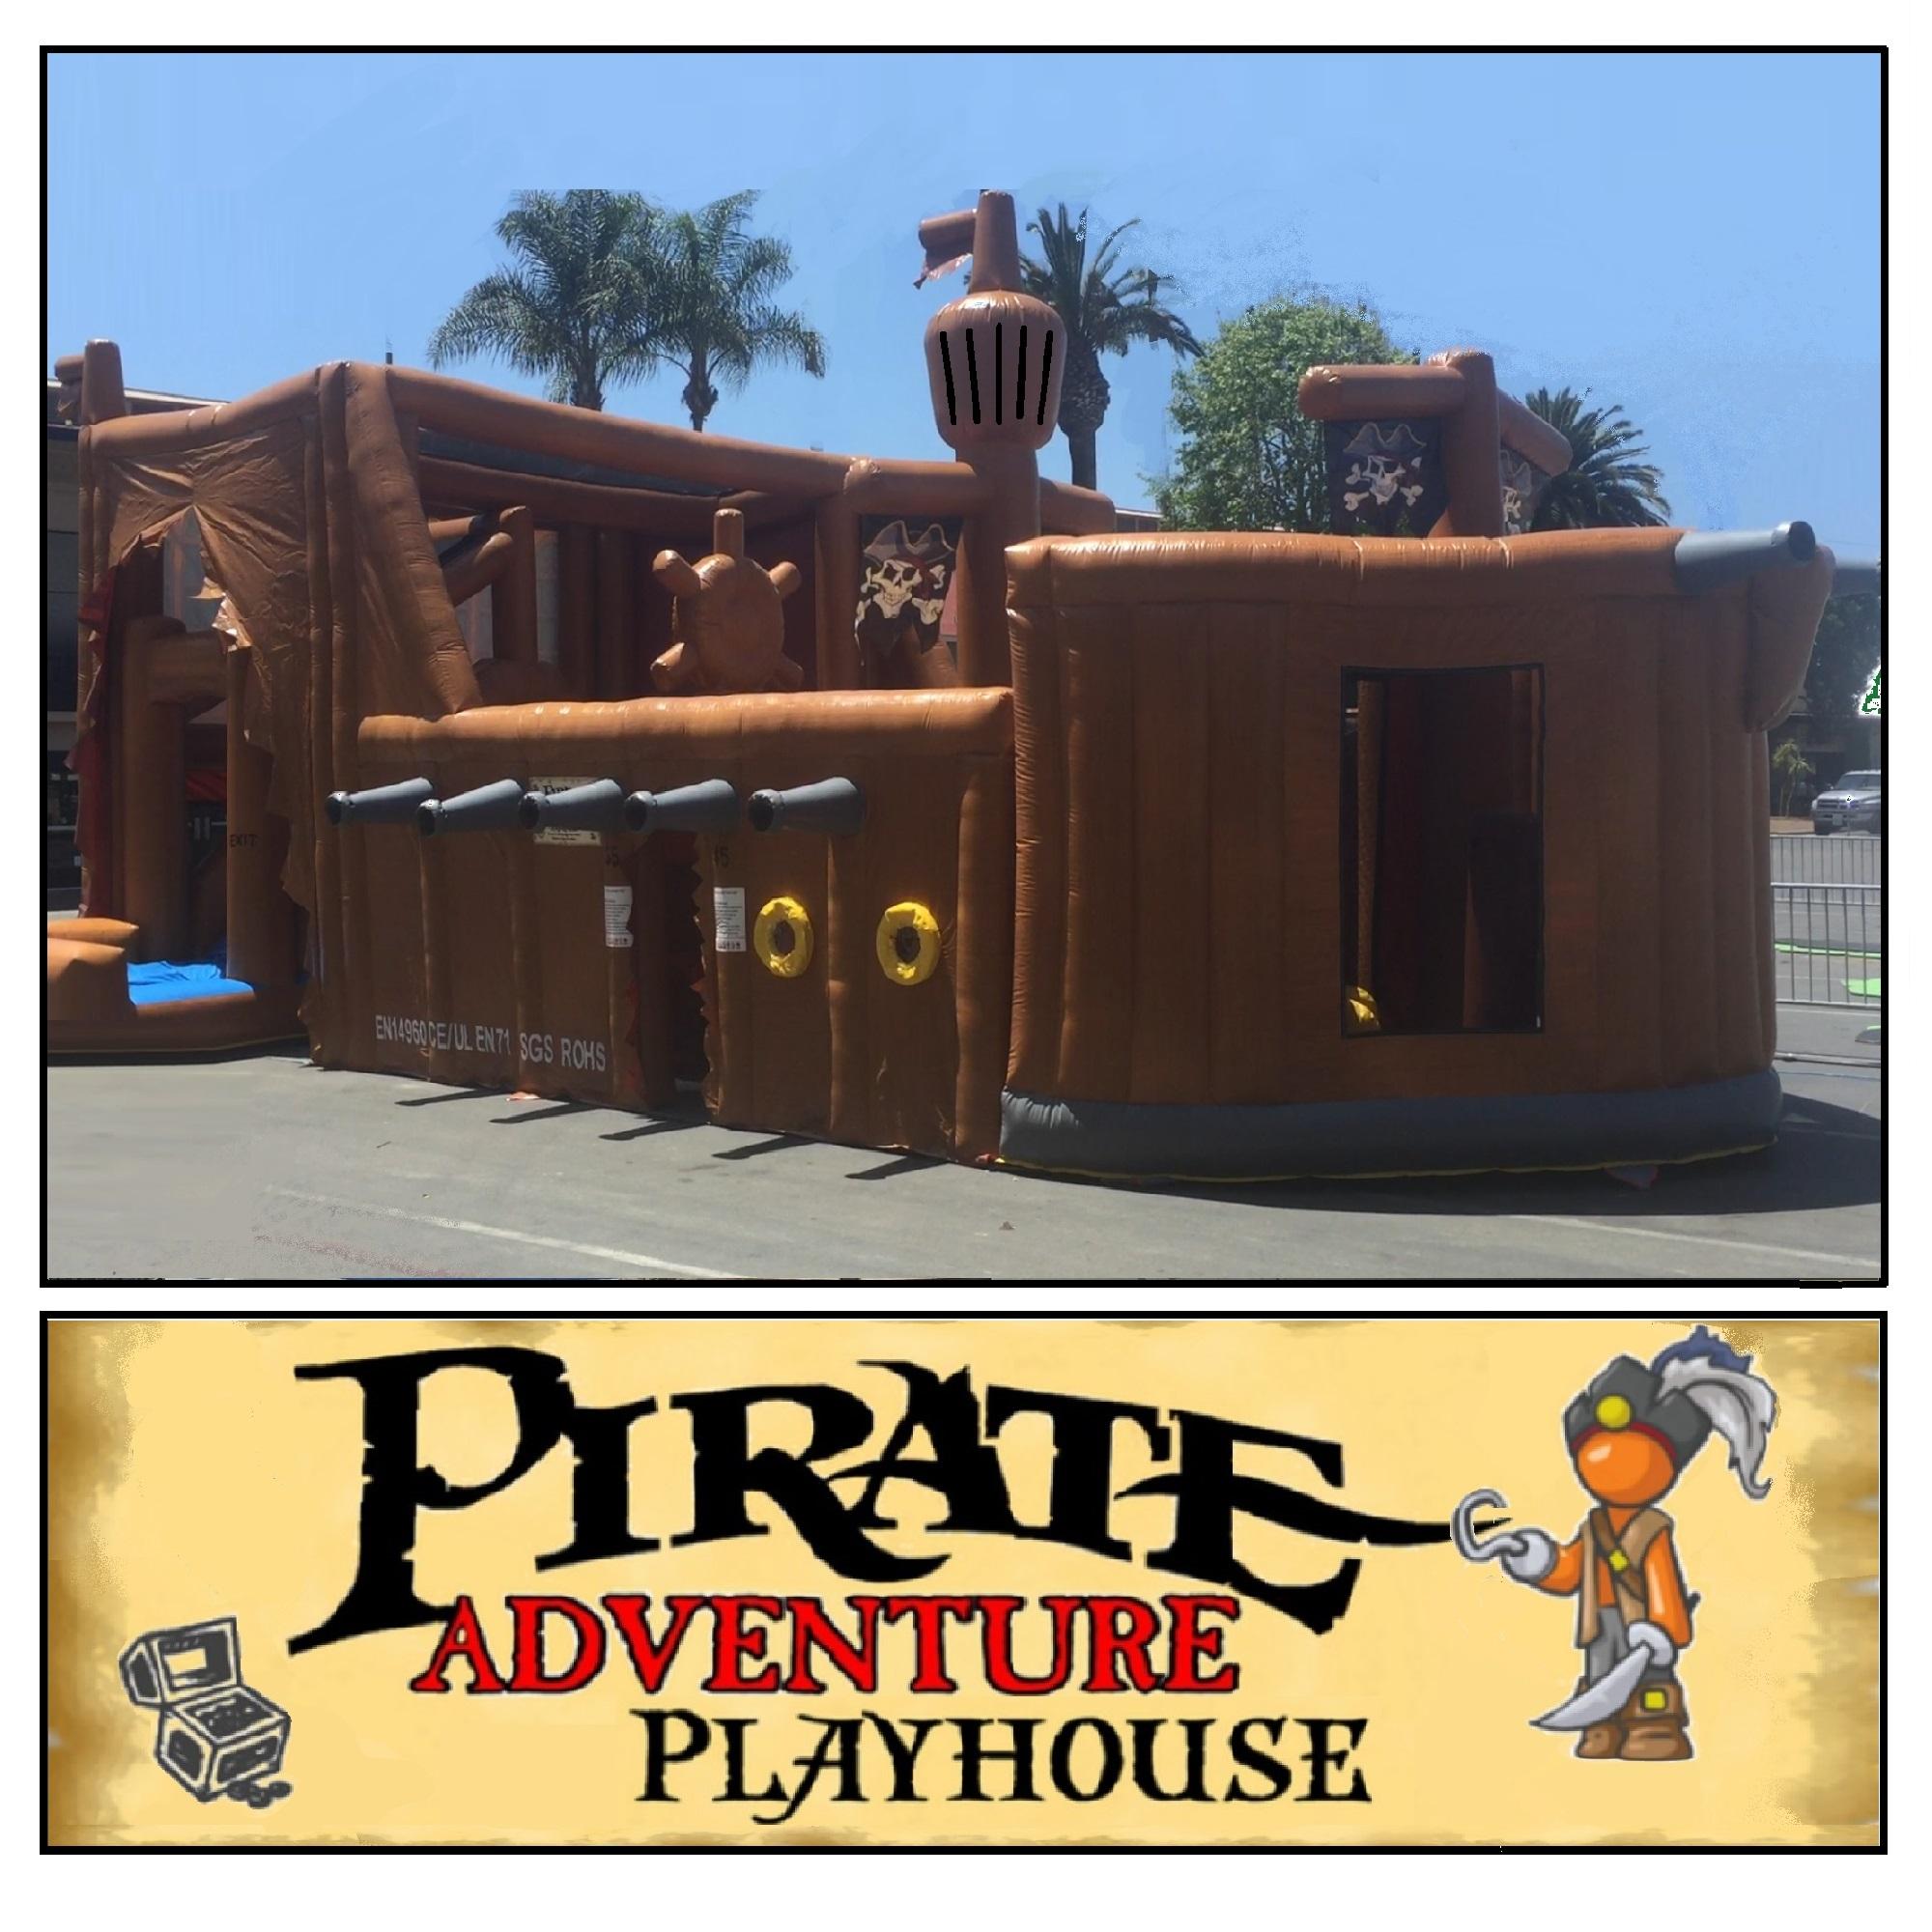 Pirate Adventure Playhouse Kids Zone